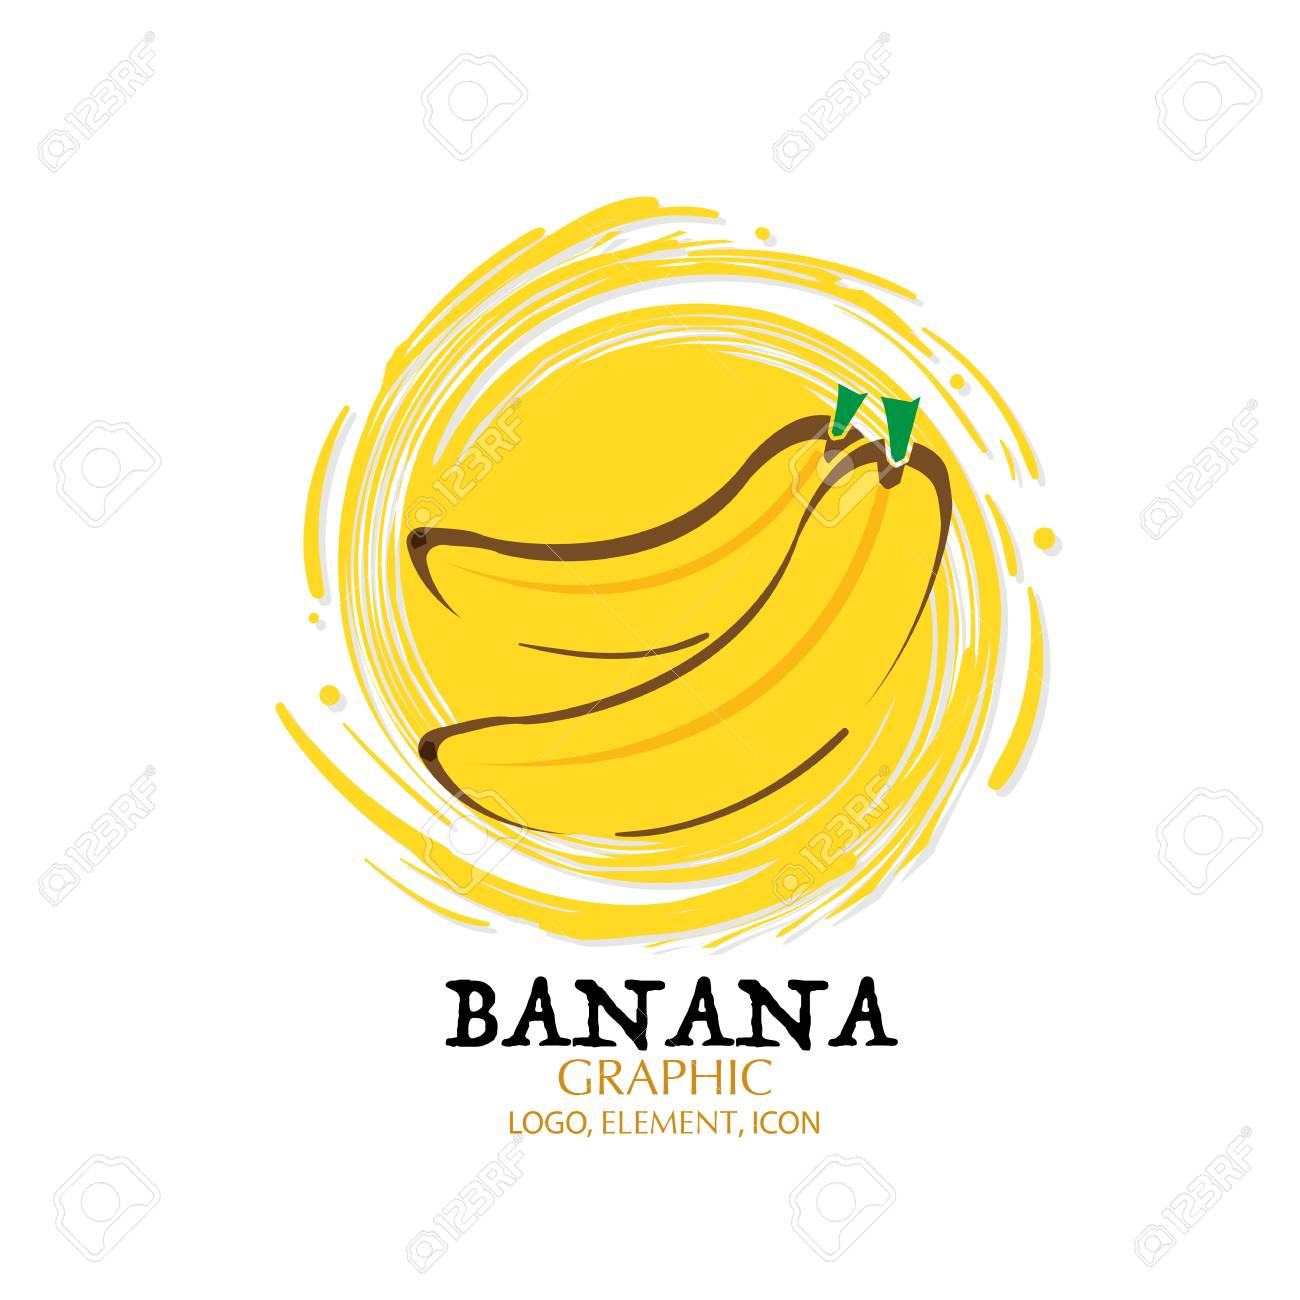 Fruit Banana Graphic Element Design Logo Key Visual Water Splash